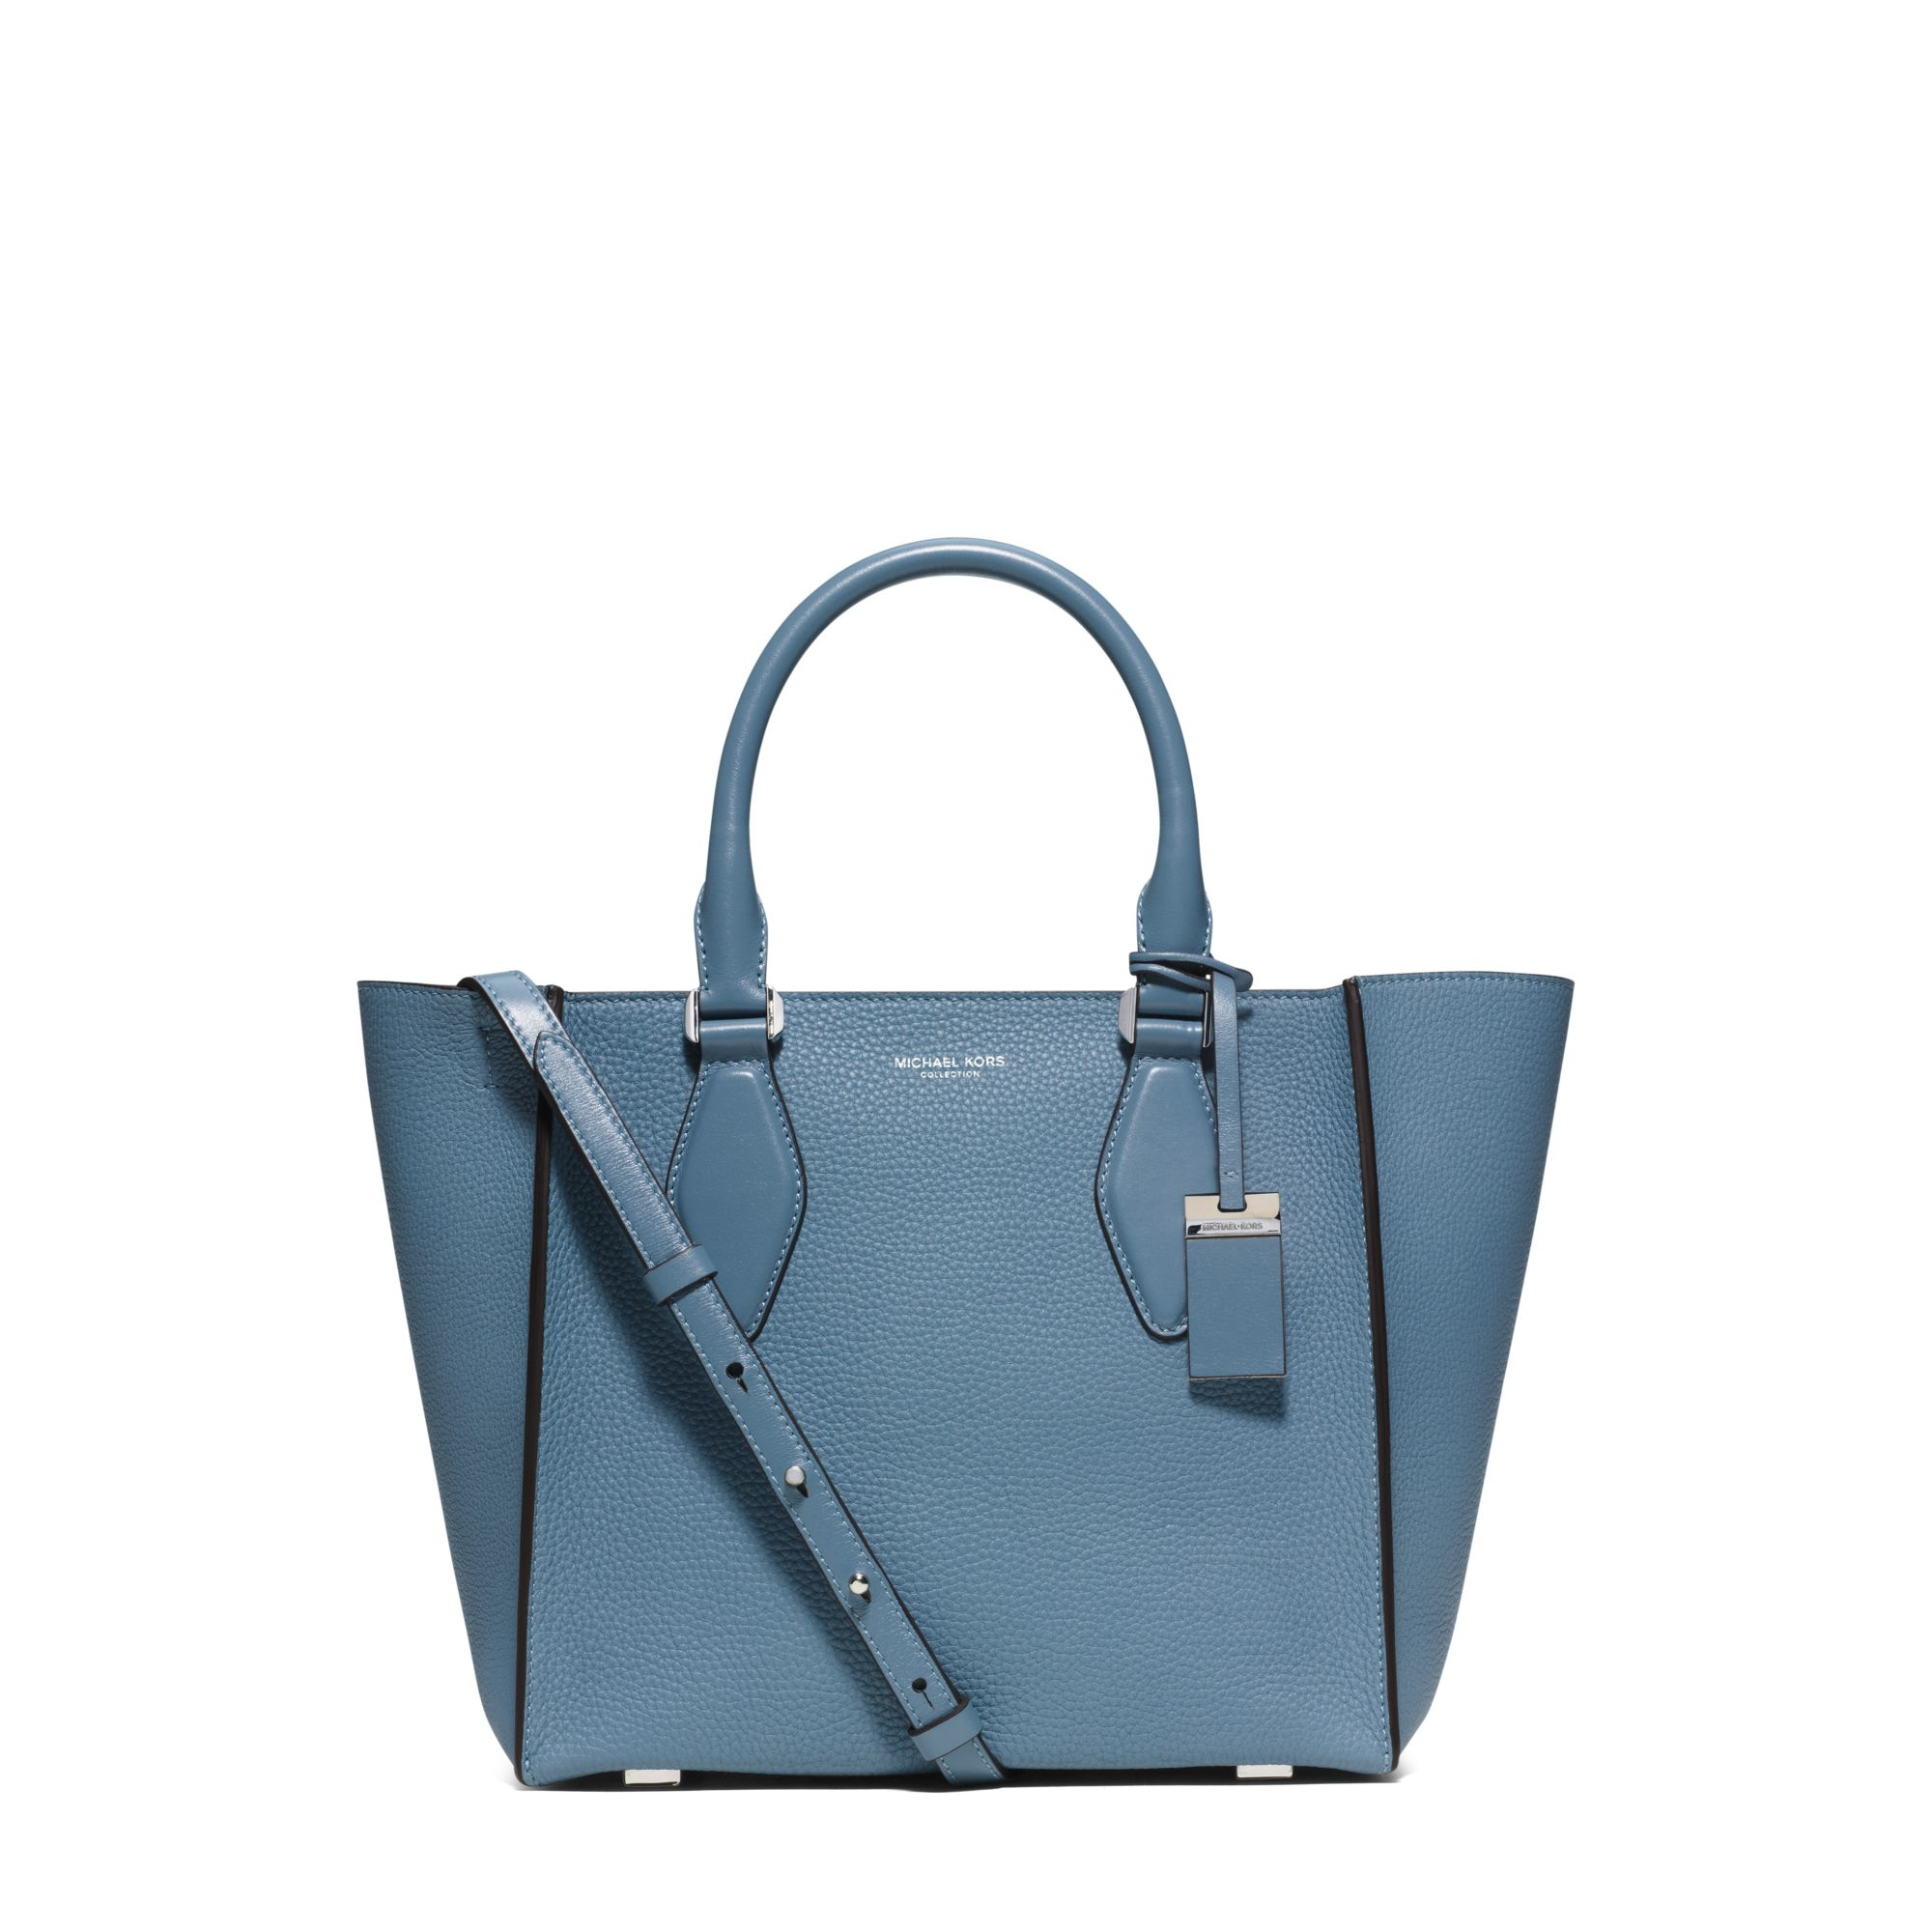 d41390b6dde2 Lyst - Michael Kors Gracie Medium Leather Tote in Blue